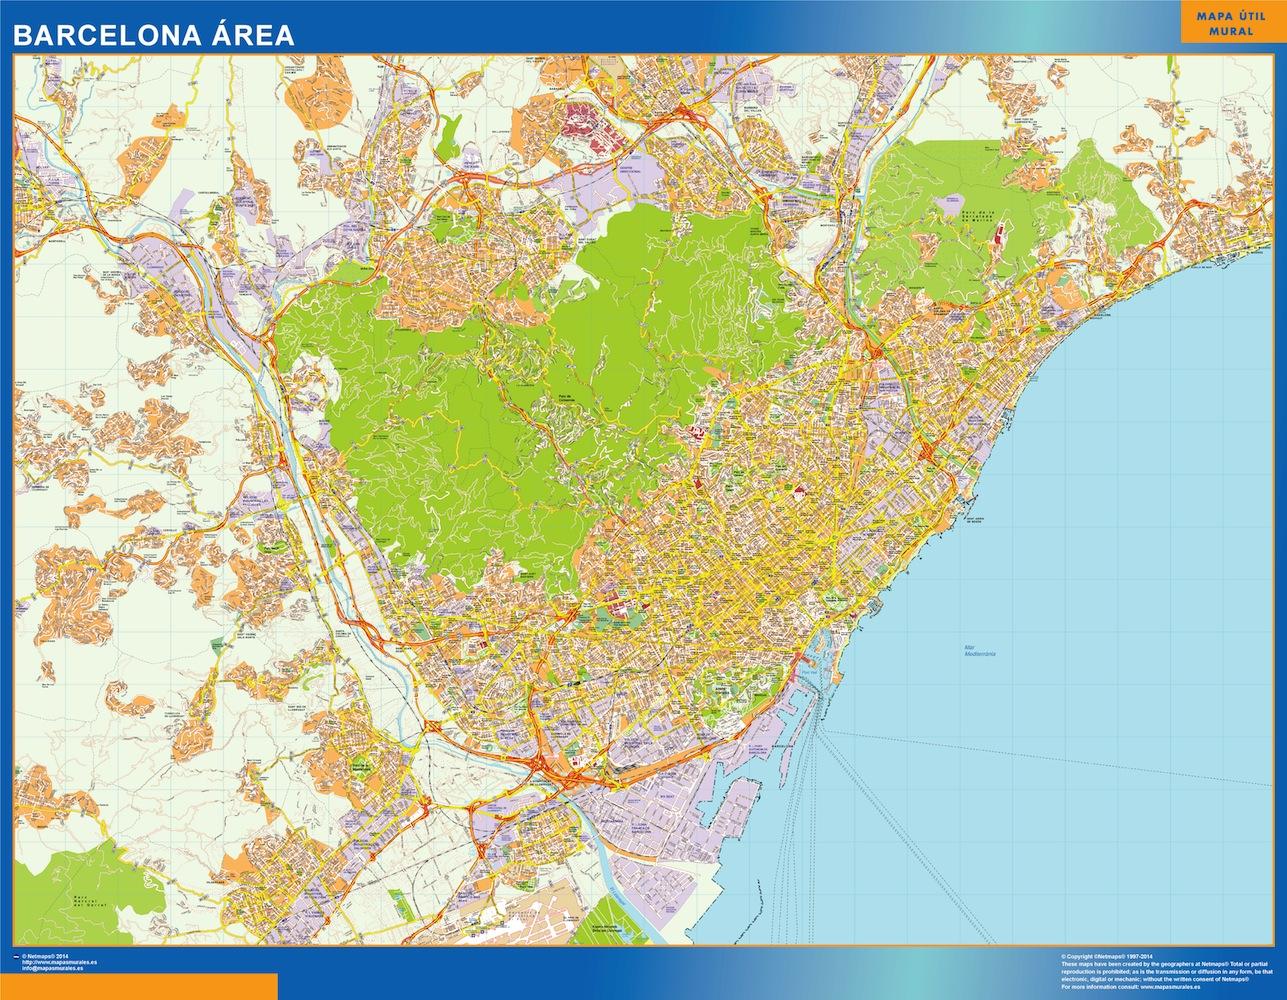 Mapa Gigante Barcelona Area